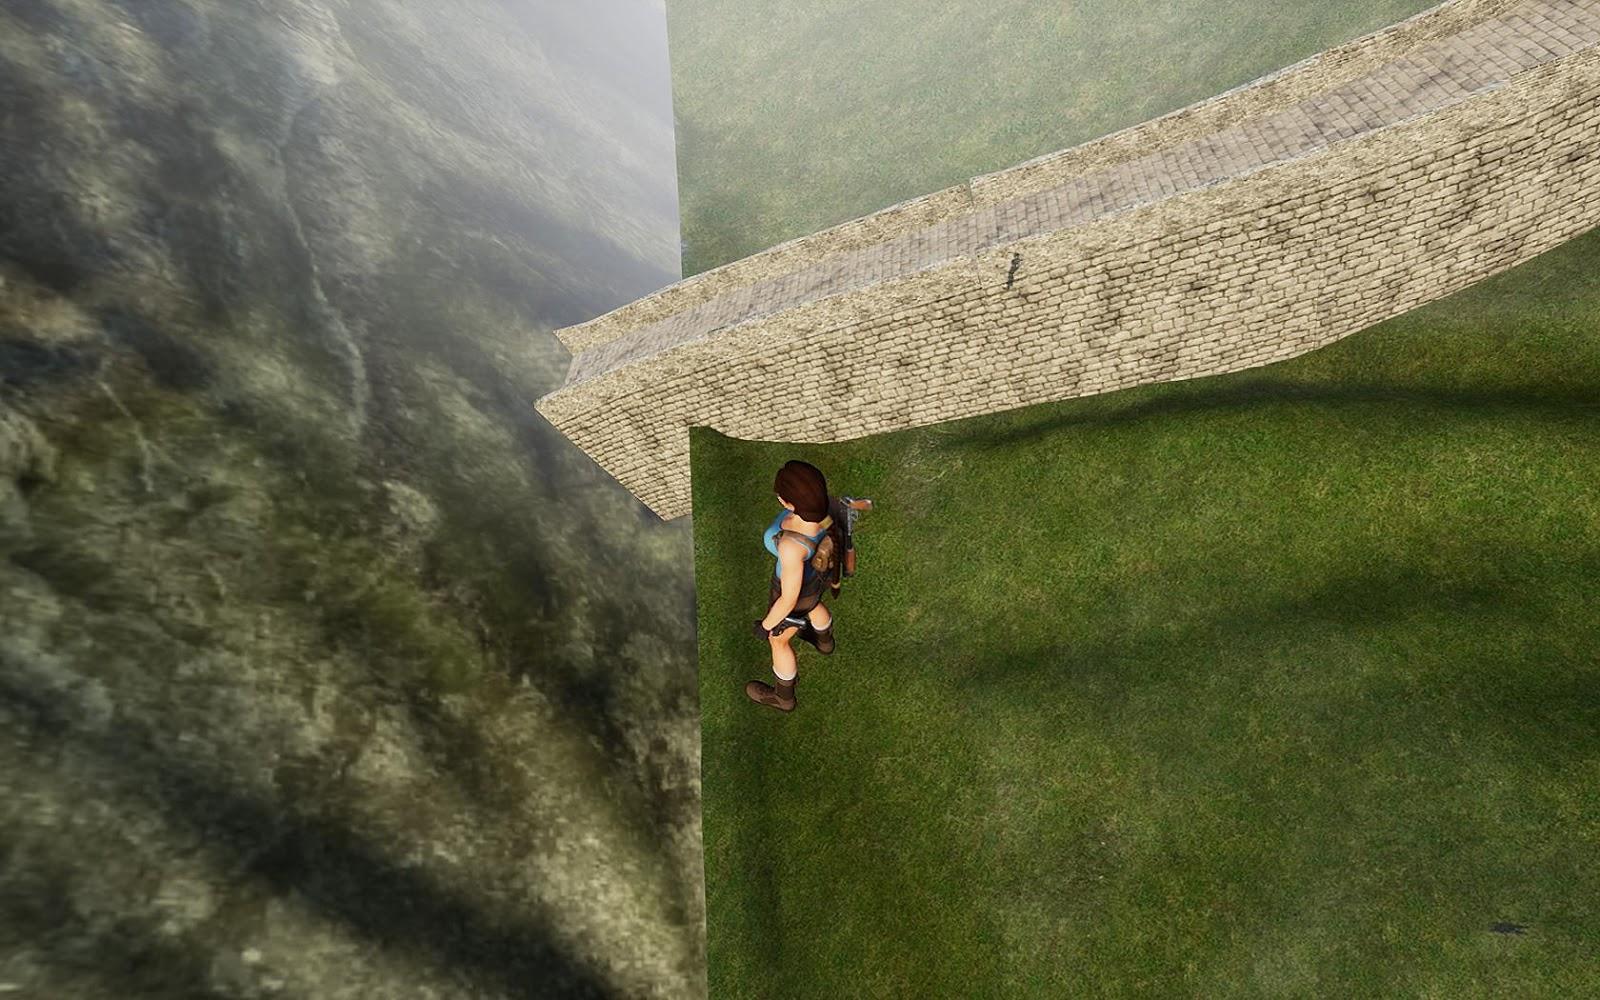 【其他】Tomb Raider Dox Demo & 蘿拉舞空術 @古墓奇兵 系列(Tomb Raider) 哈啦板 - 巴哈姆特